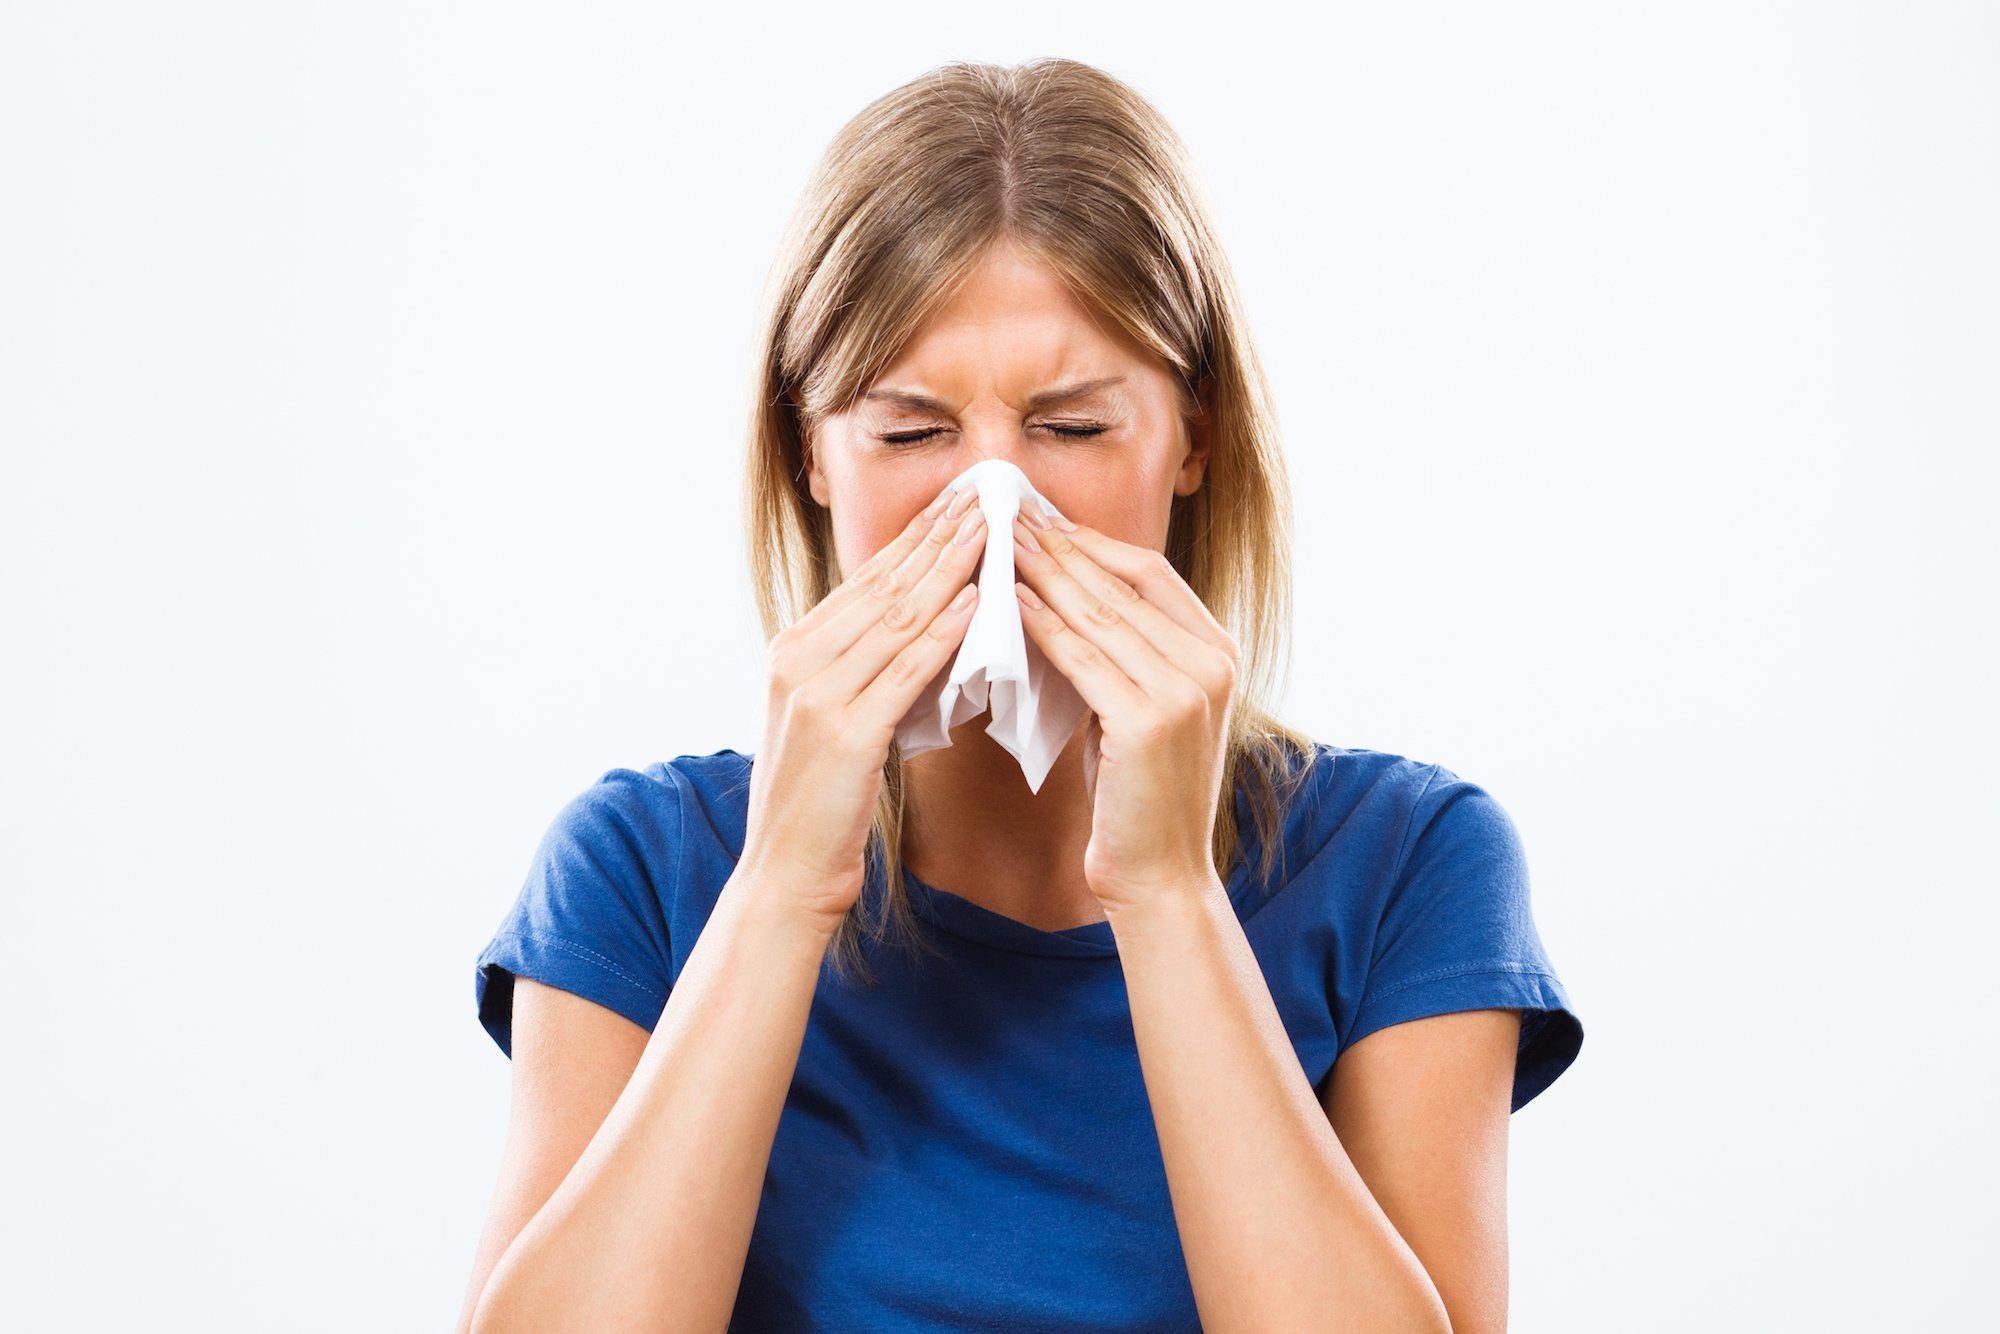 10 Ways To Stay Healthy This Flu Season